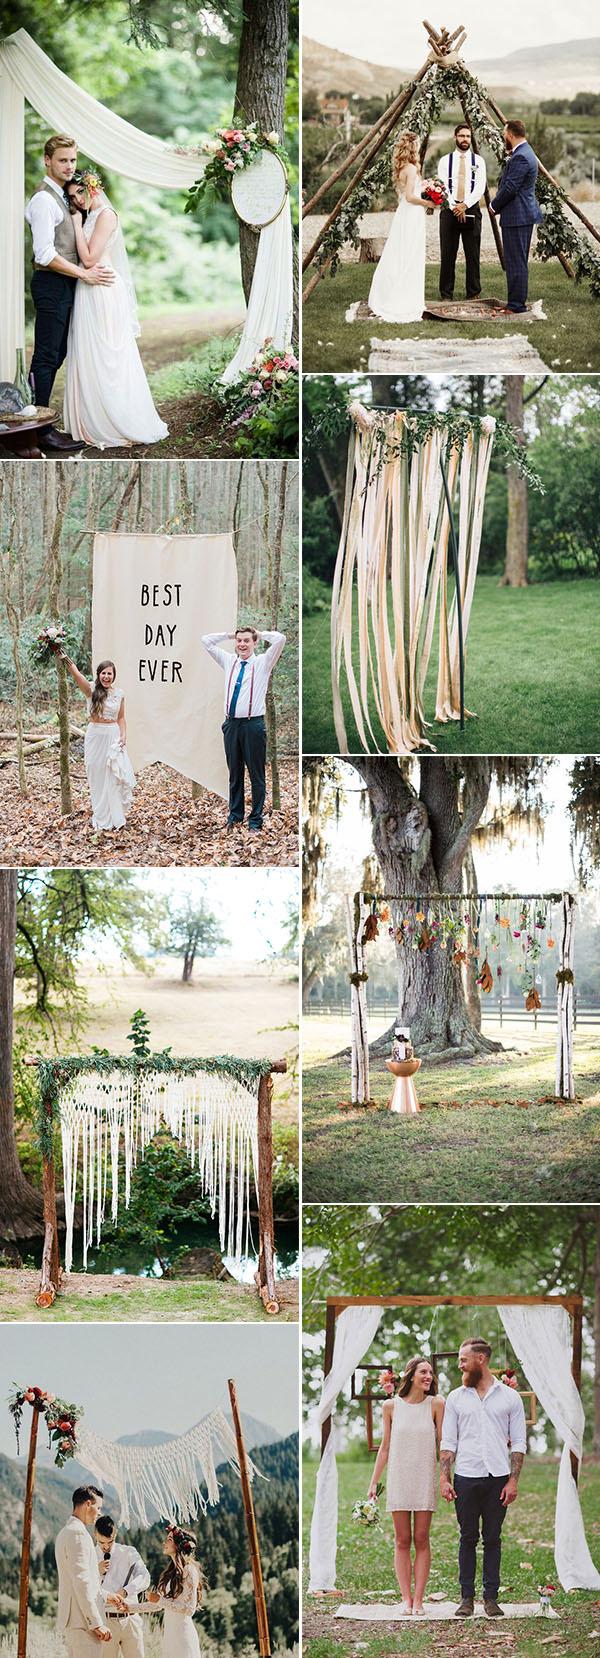 Redneck Wedding Decoration Ideas 25 Chic And Easy Rustic Wedding Arch Ideas For Diy Brides